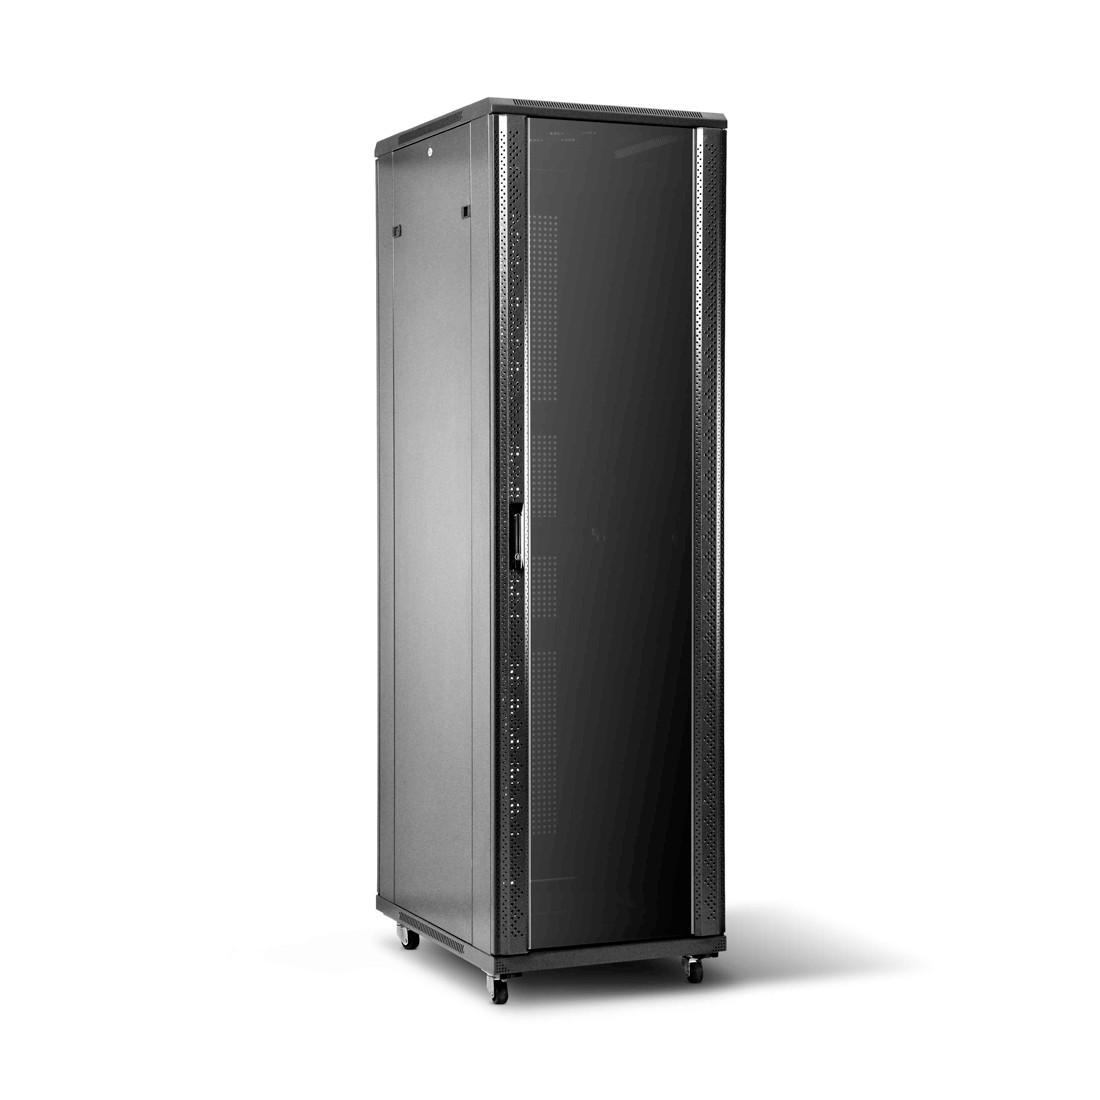 Шкаф серверный SHIP 601S.6838.24.100 38U 600*800*1800 мм